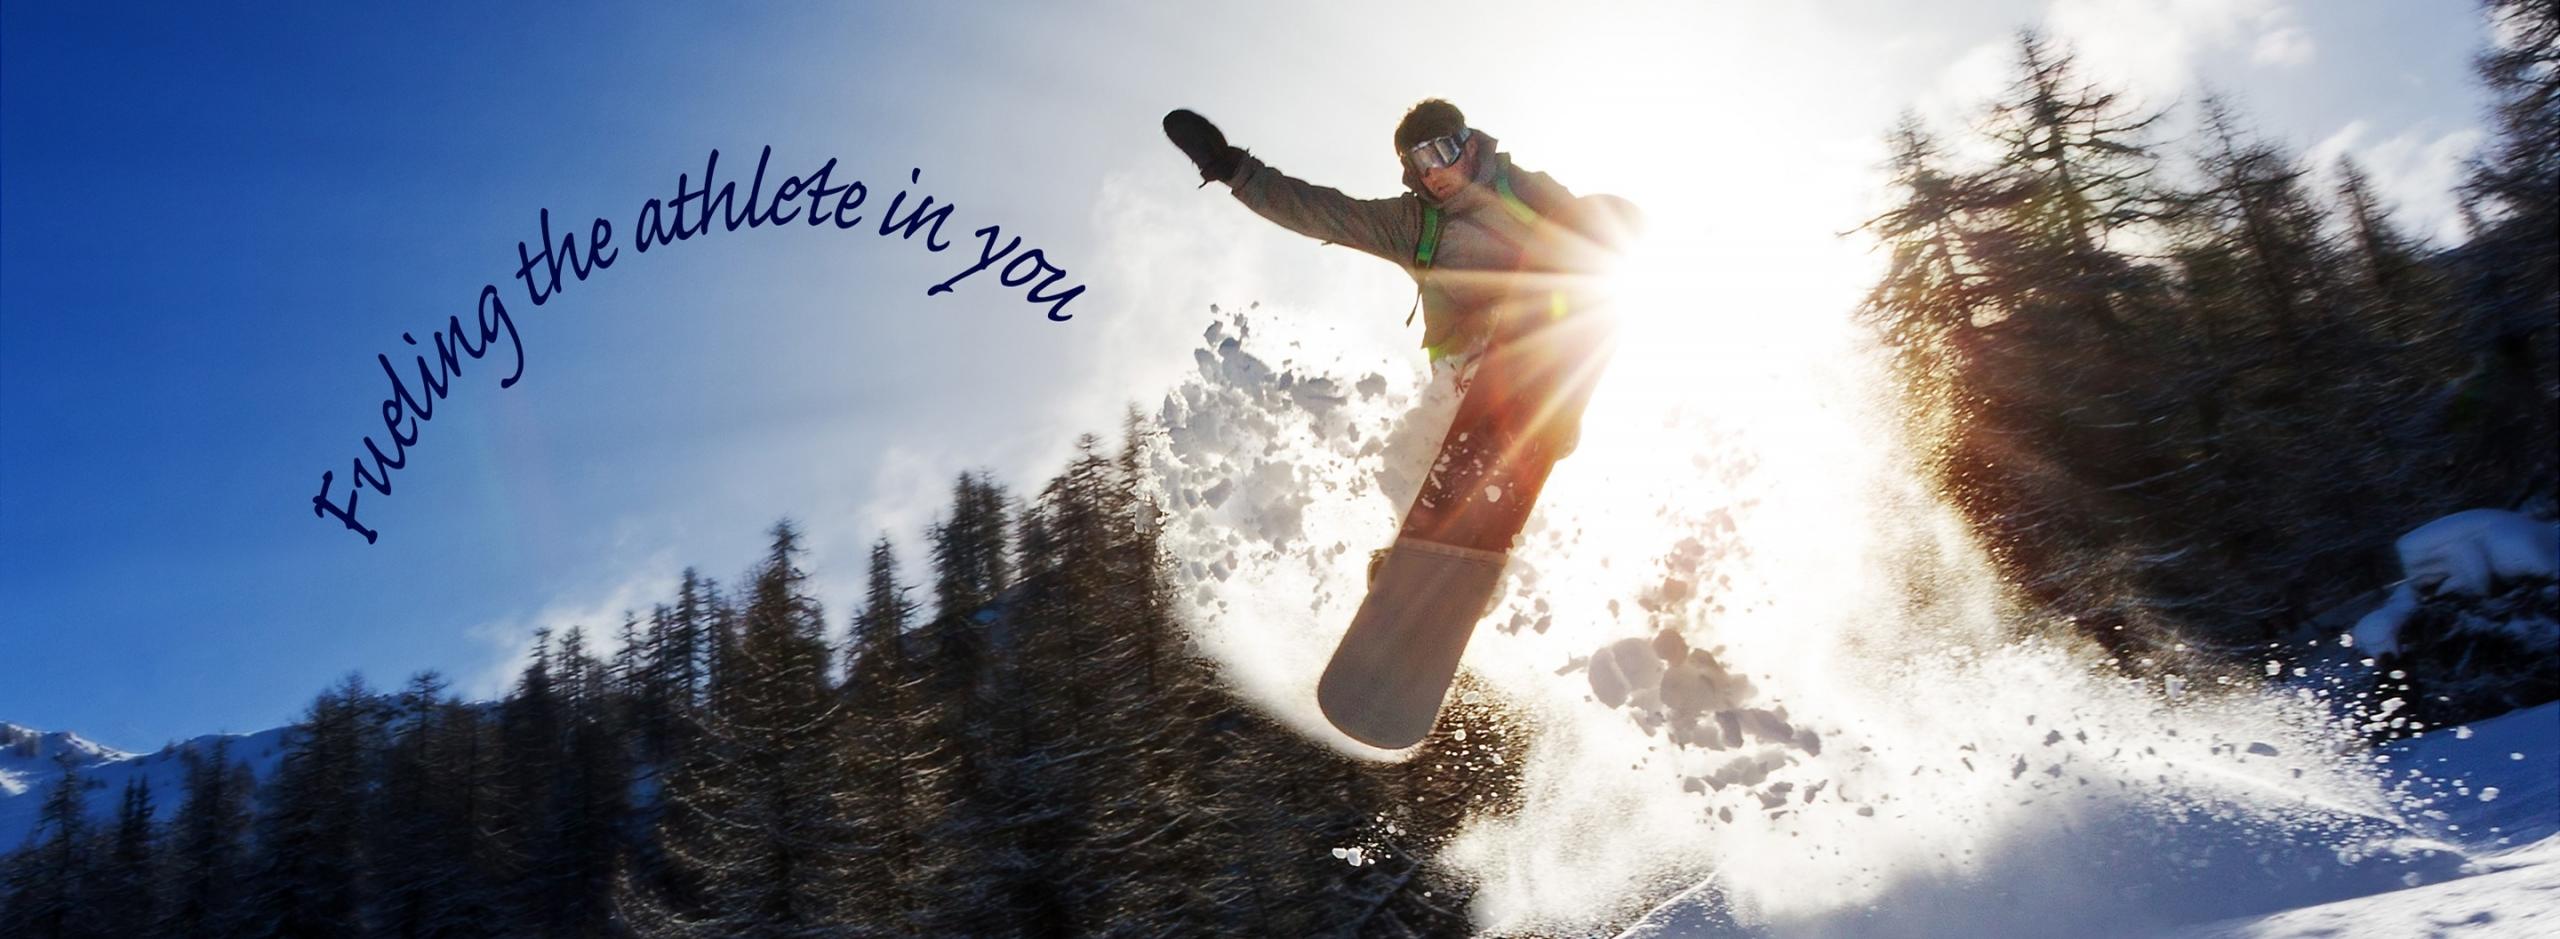 Coach's Oats Winter Ski